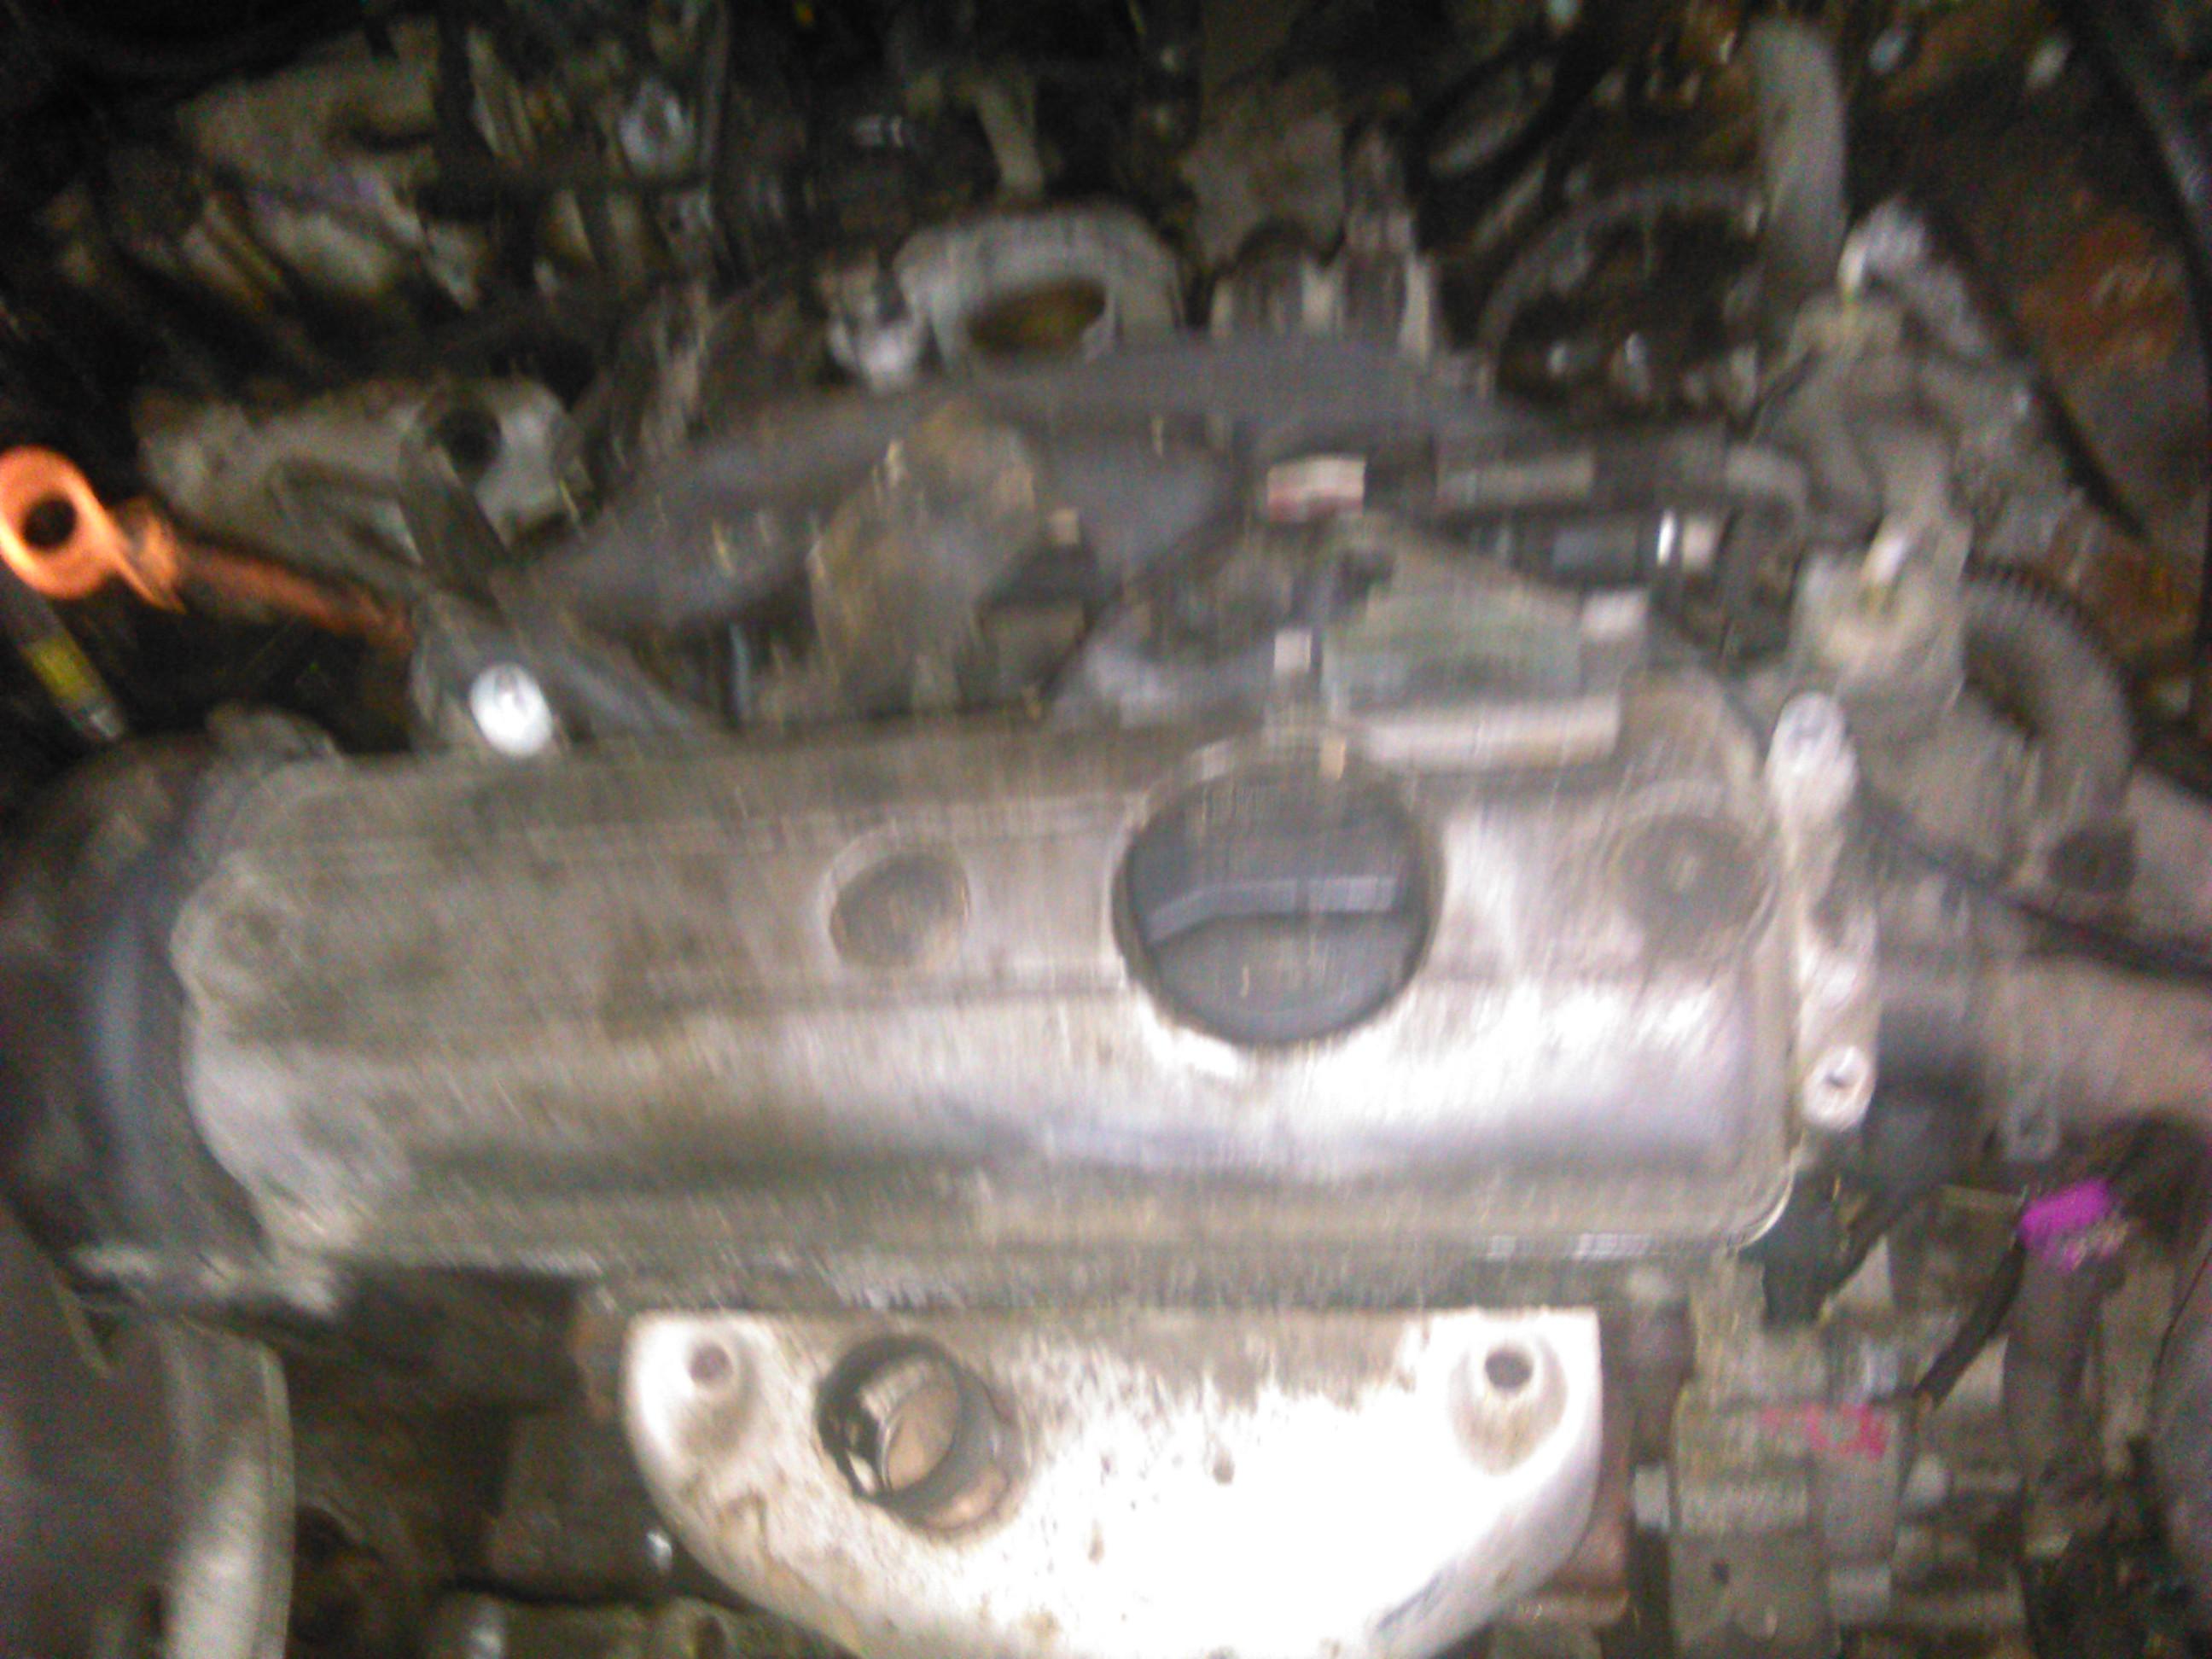 Alternator Fiat Albea 1.2, Fiat doblo 1.2, fiat palio 1.2, punto 1.2, Strada 1.2 cod 63321602